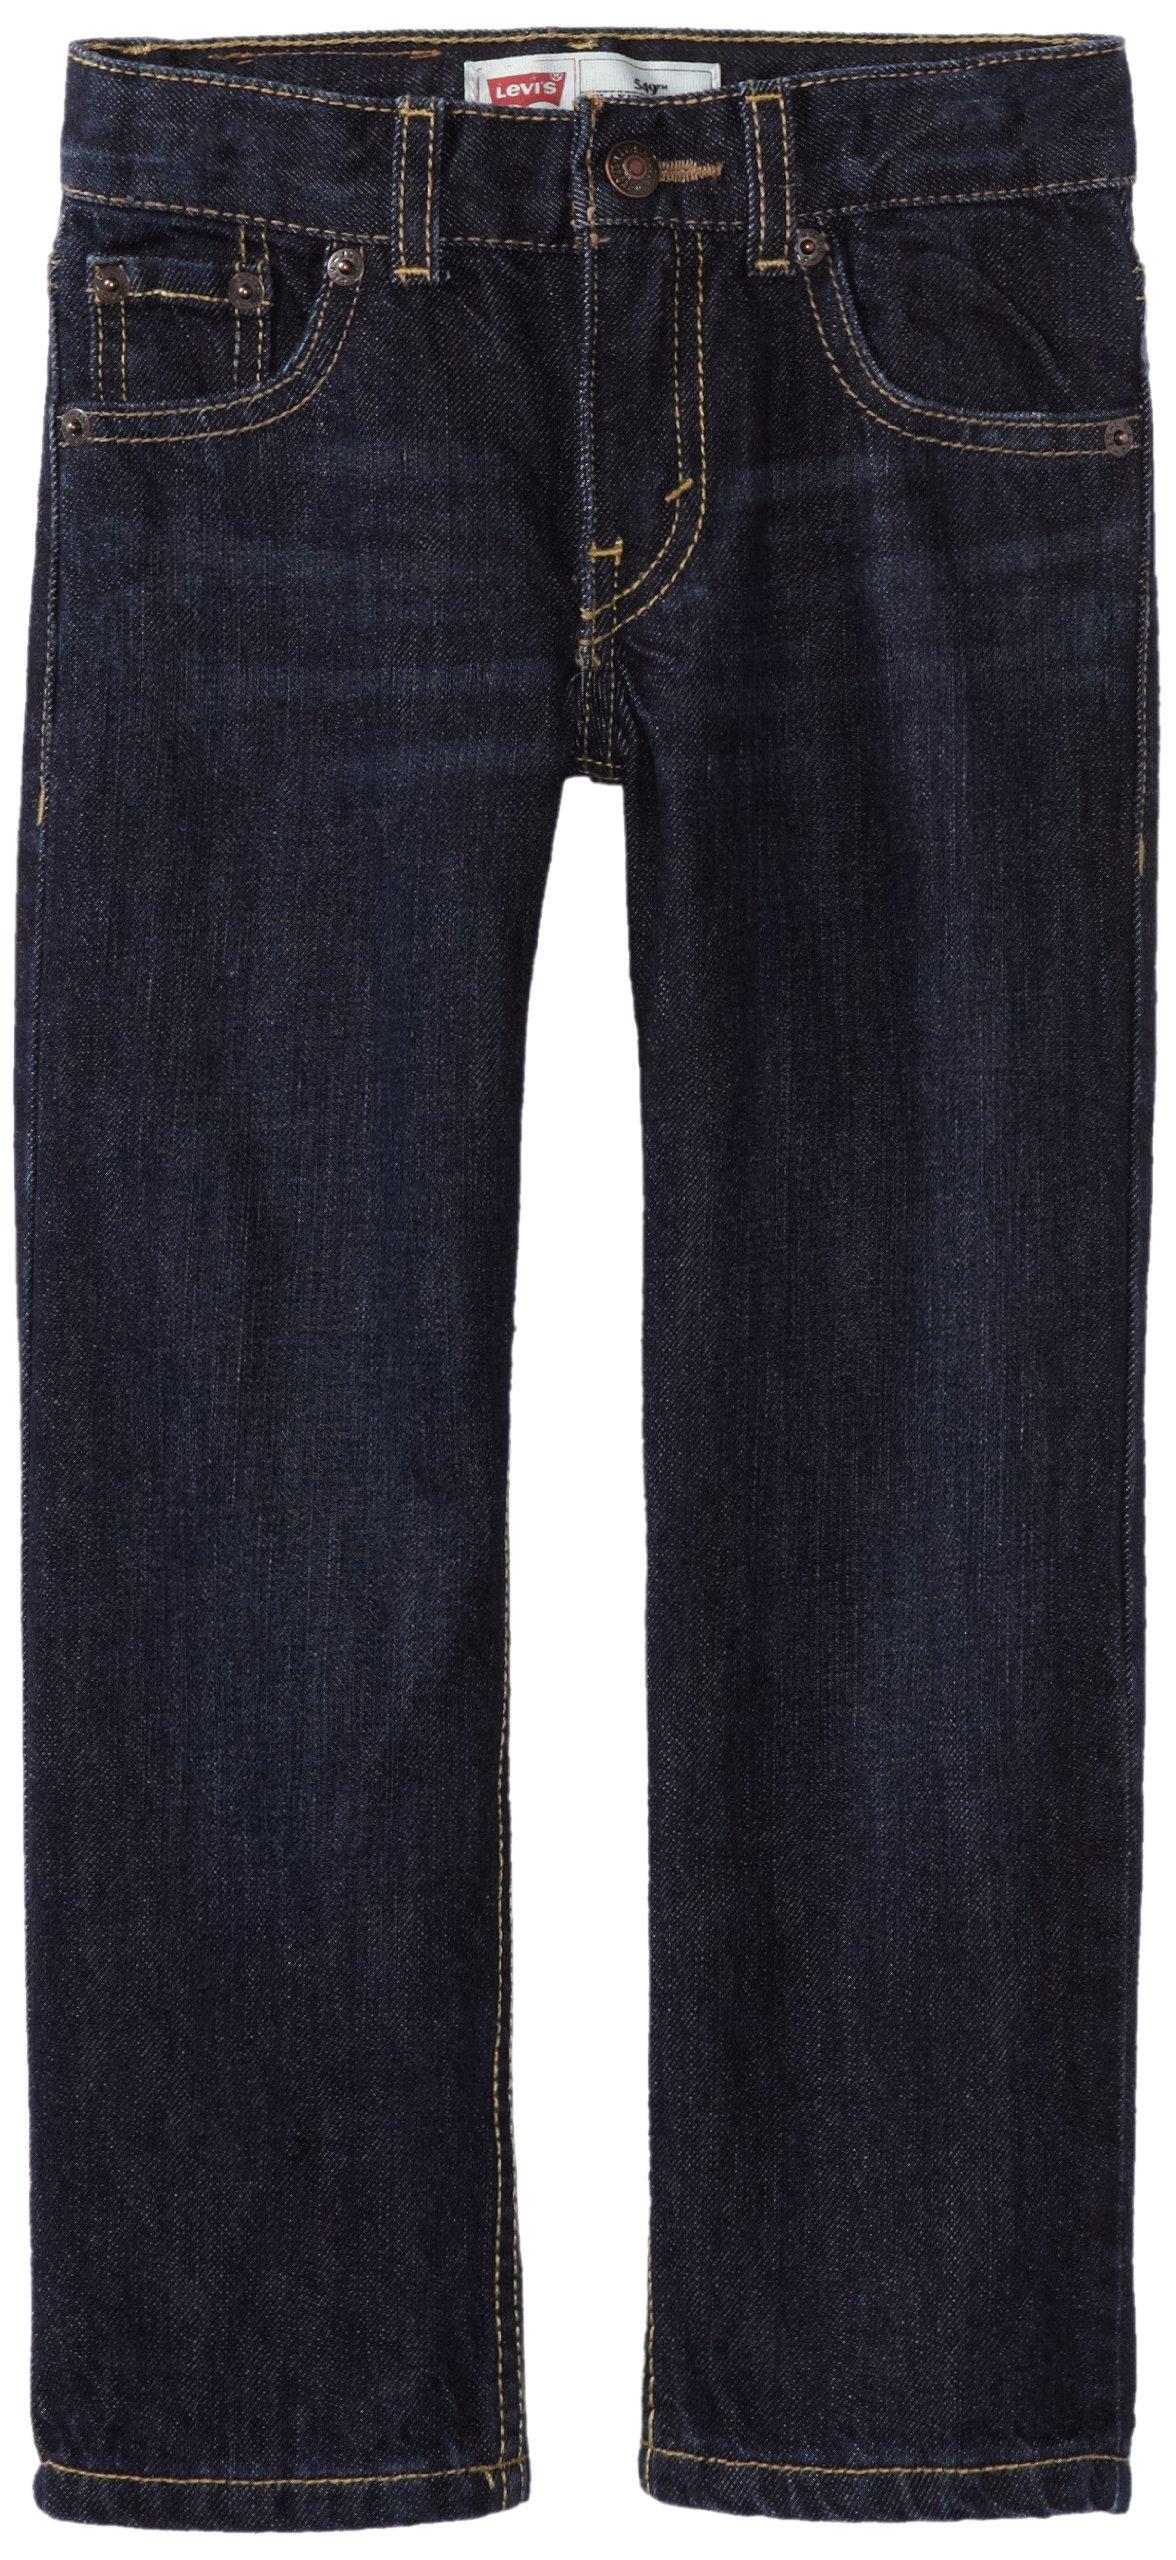 Levi's Boys' 505 Regular Fit Jeans, Midnight, 14 Husky